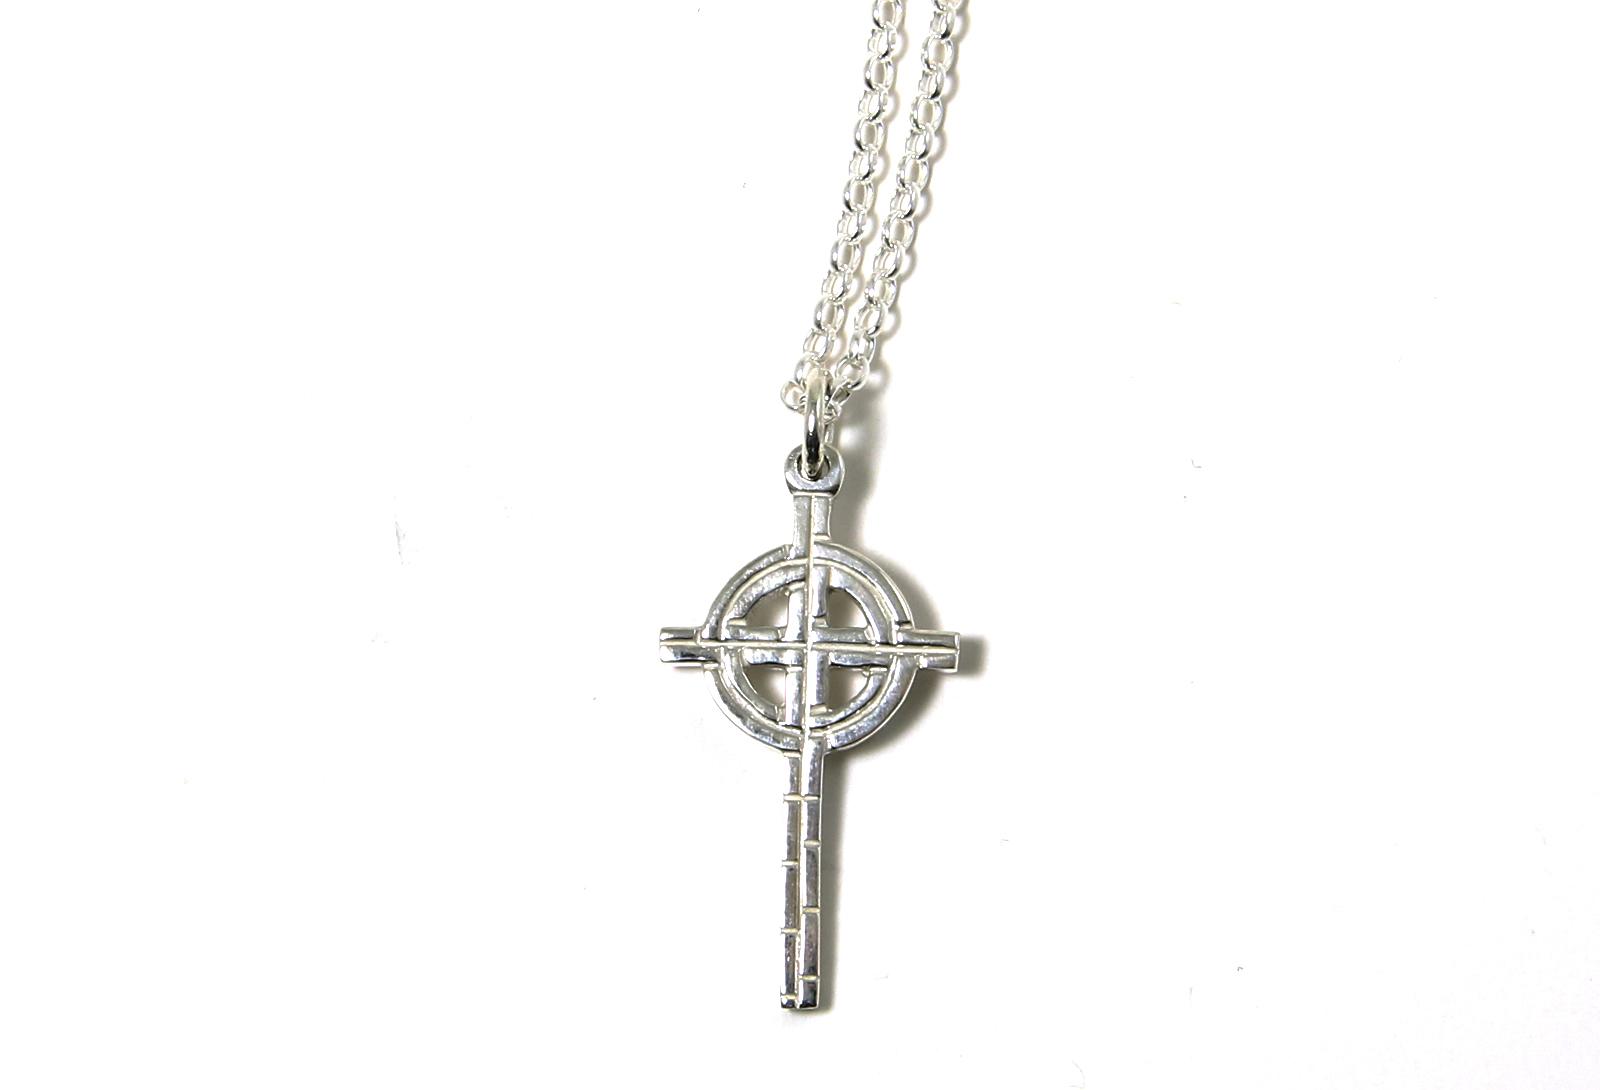 Old St Pats Cross Necklace Medium Pendant 18